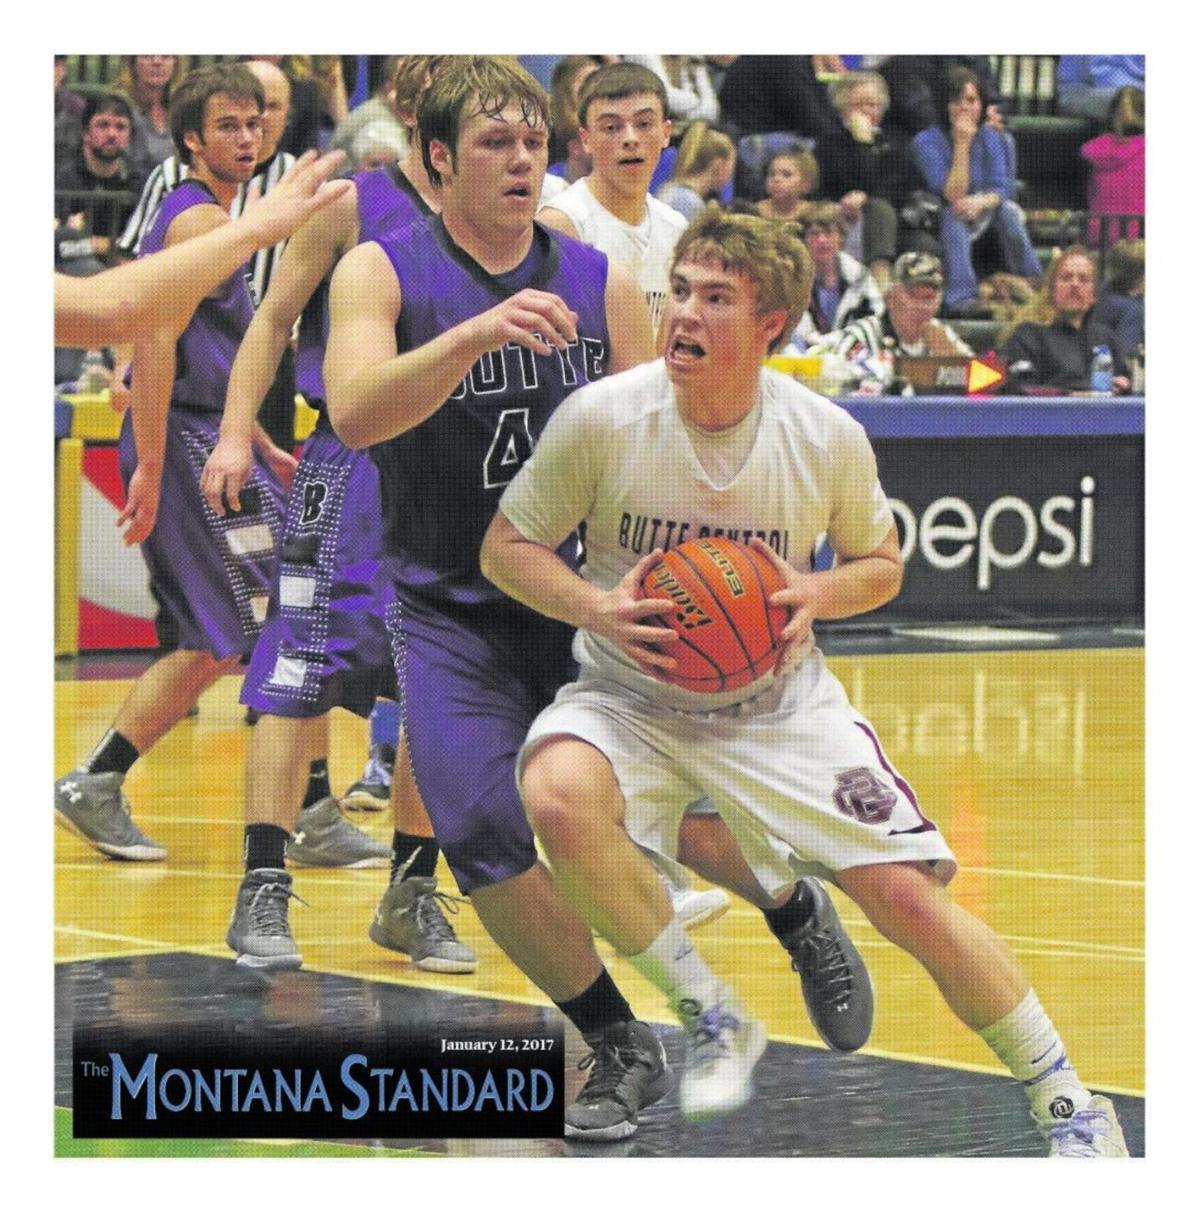 Butte High Butte Central Crosstown Rivalry